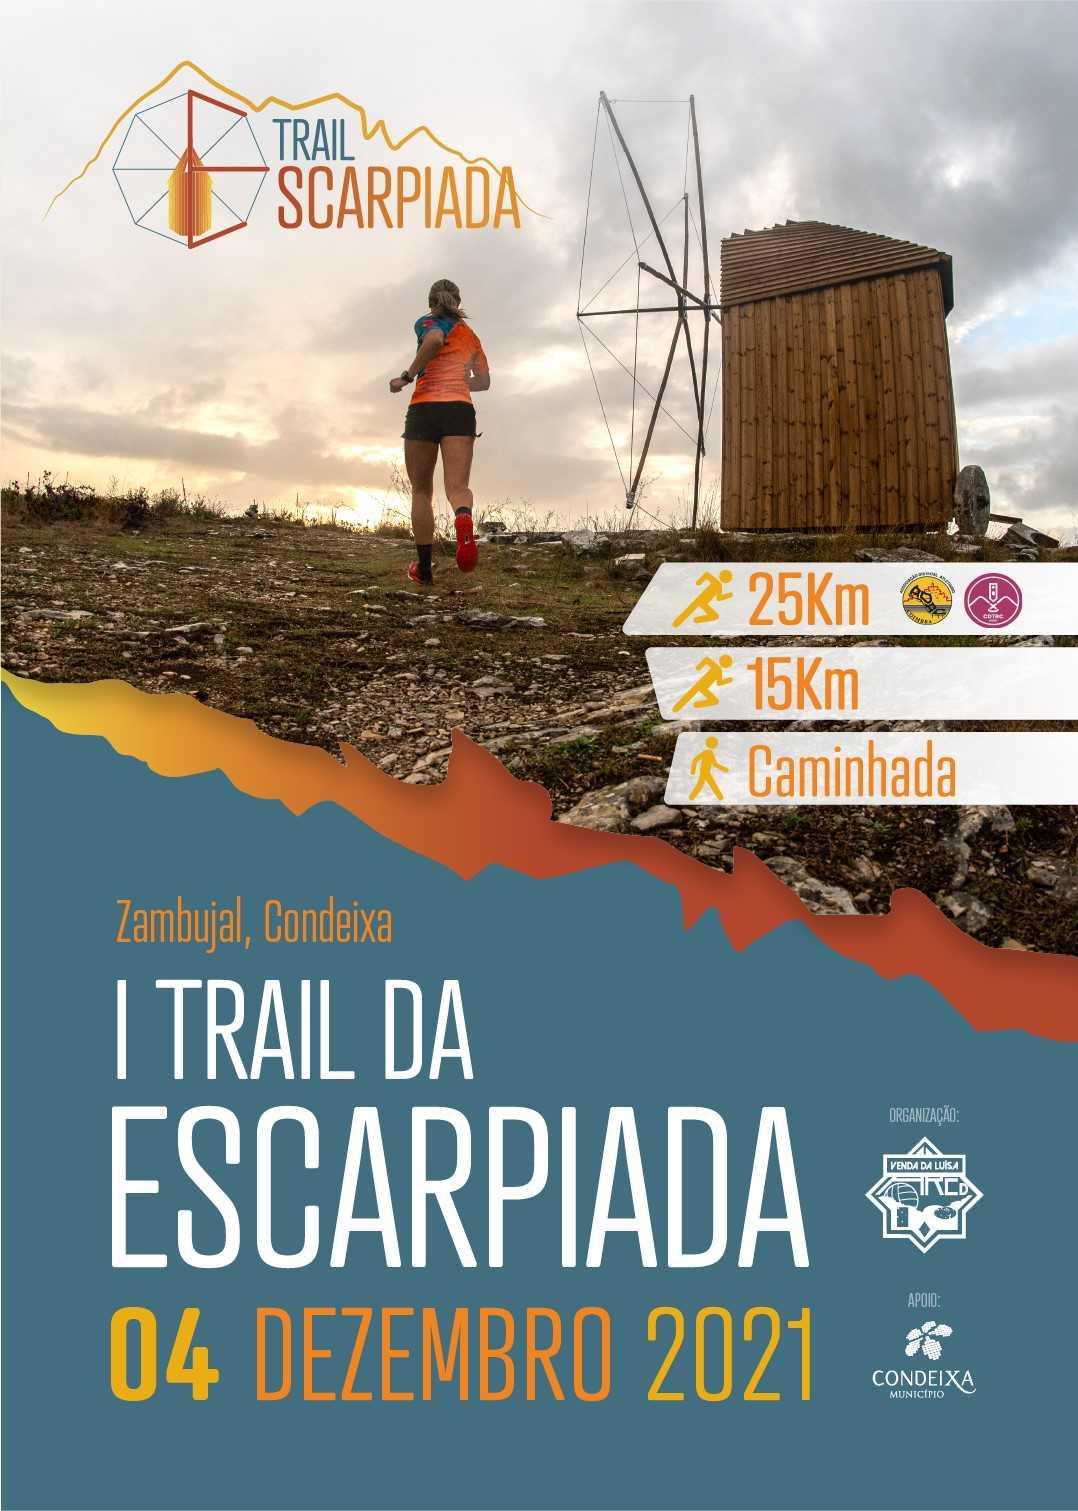 Trail da Escarpiada 2021